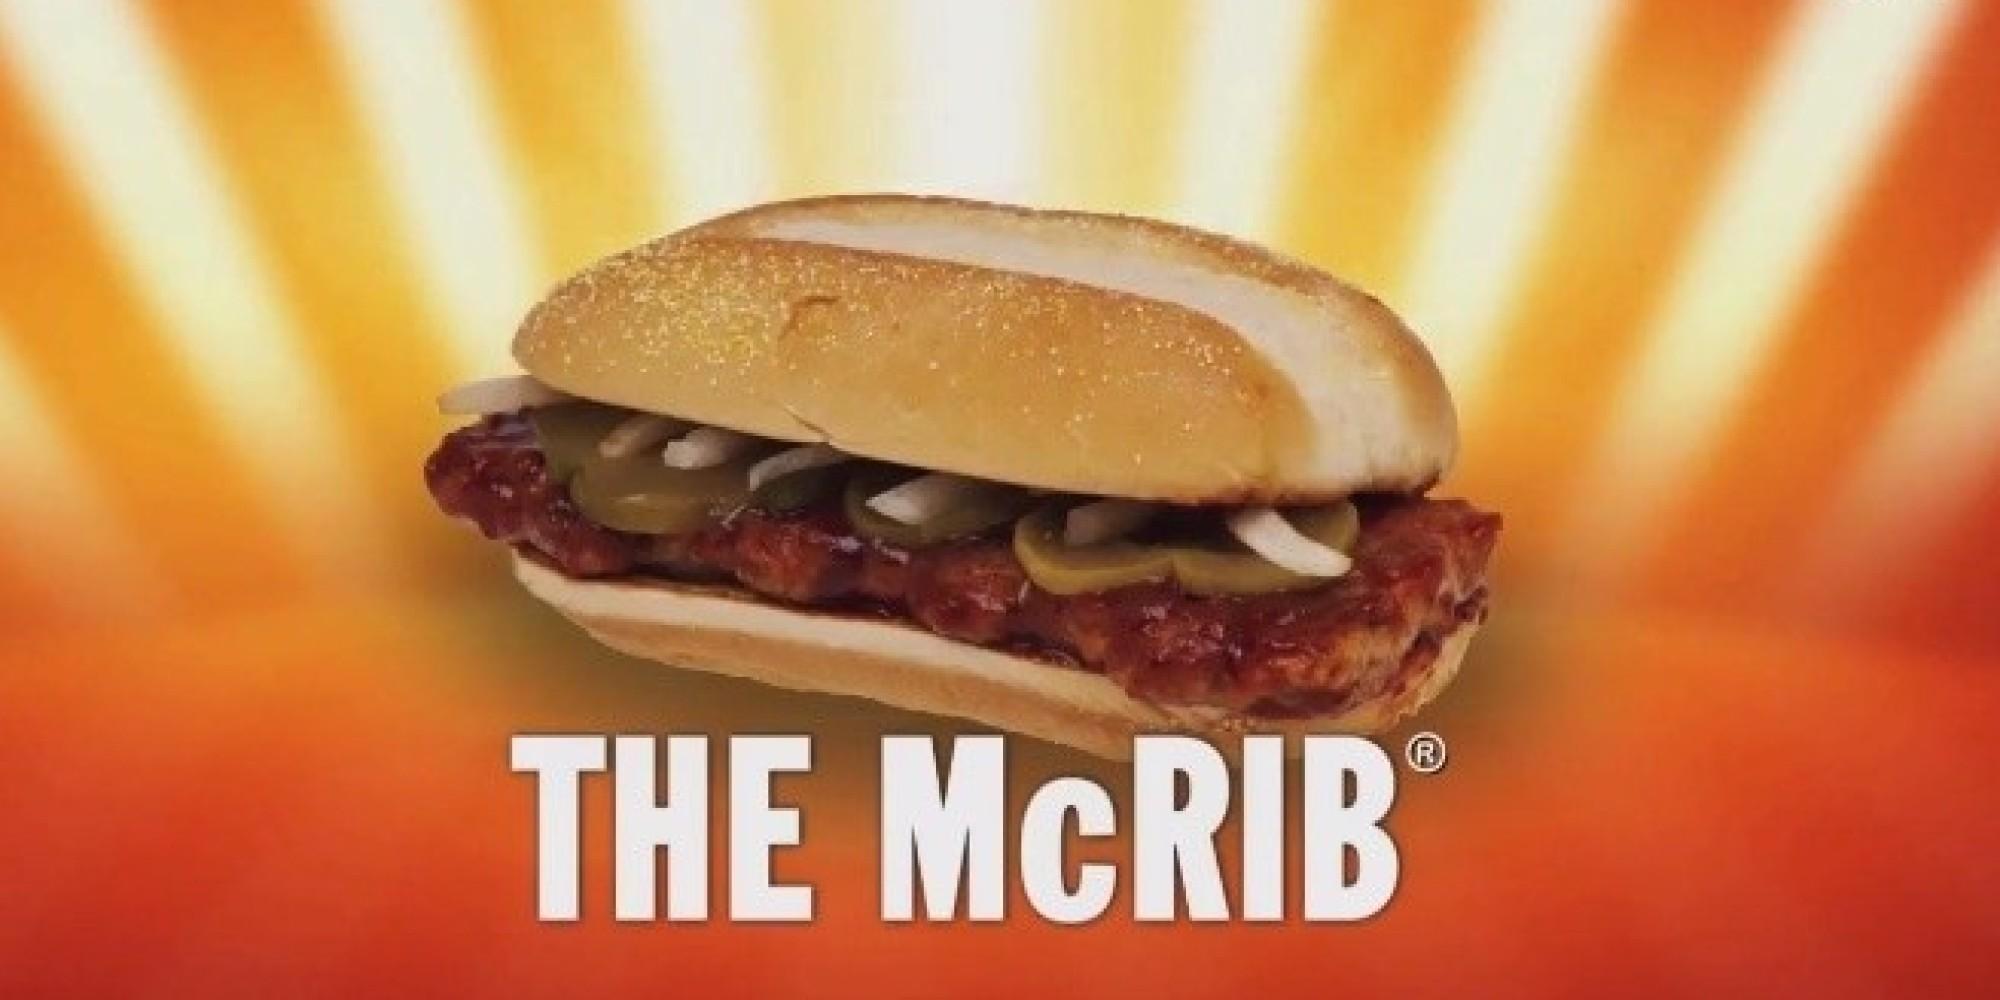 Mcdonalds celebrity spokespeople for hire